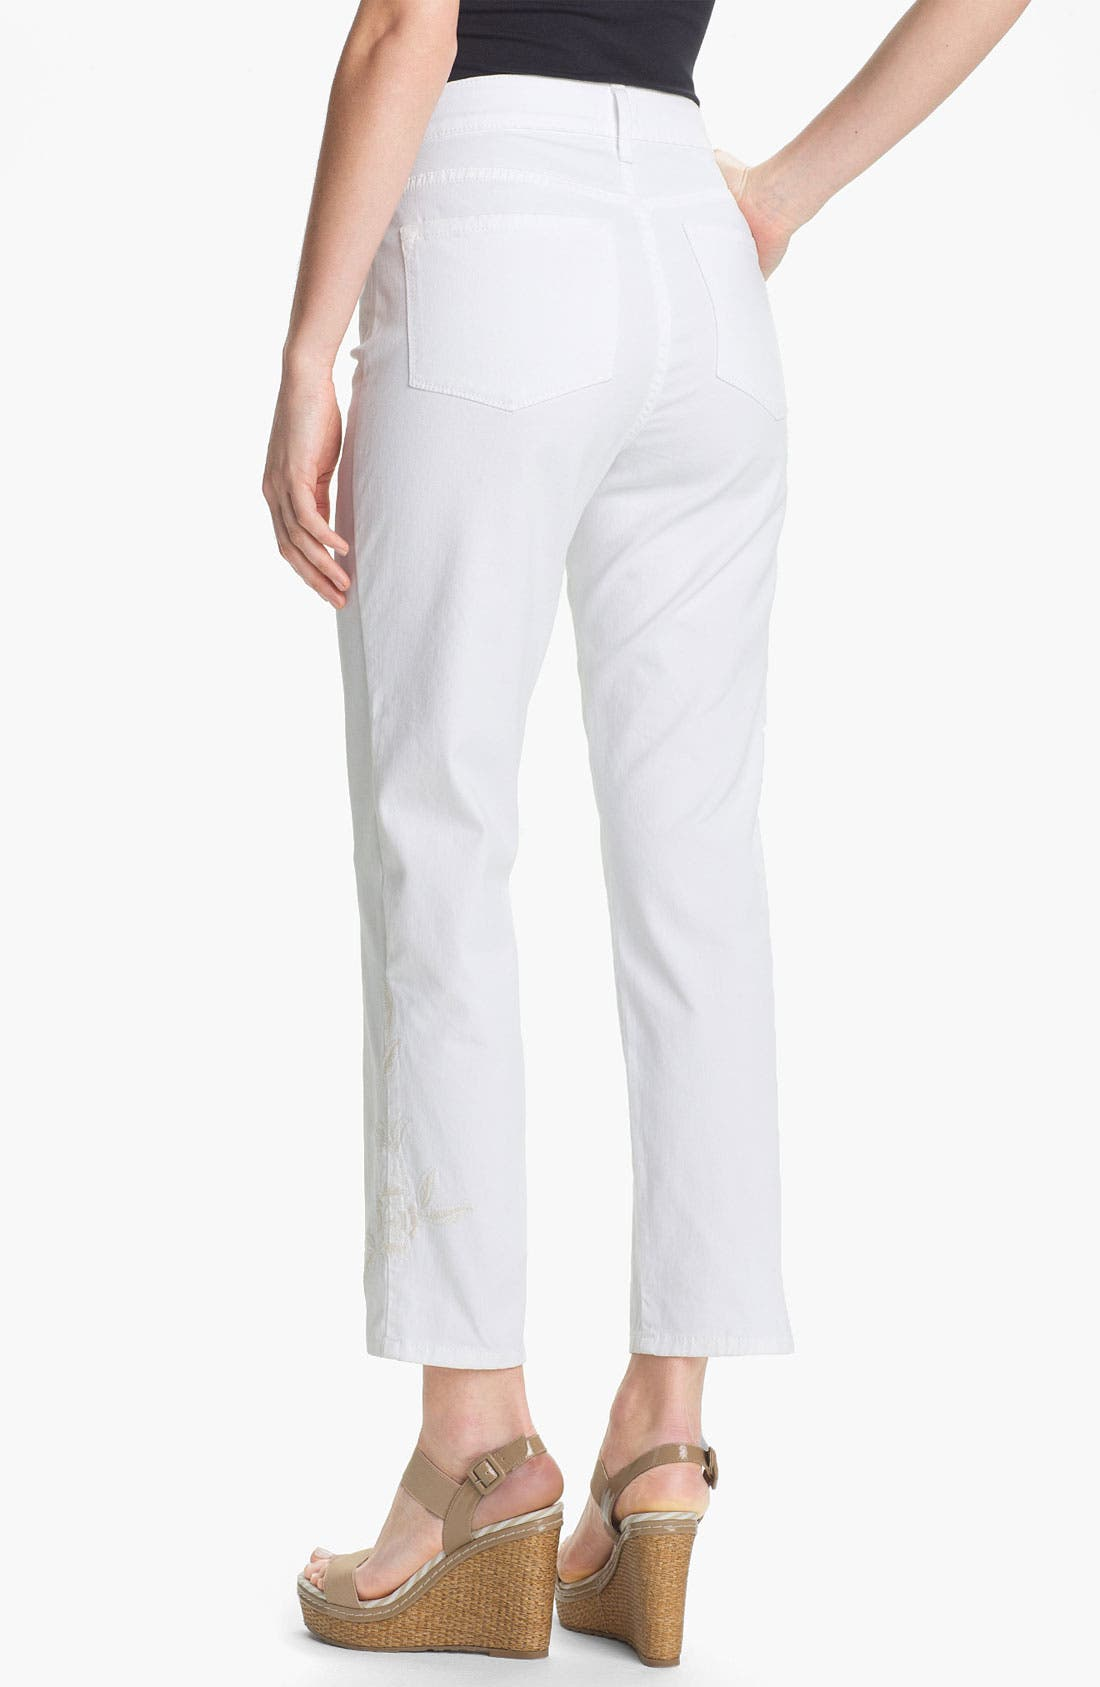 Alternate Image 3  - NYDJ 'Alisha' Embroidered Skinny Stretch Ankle Jeans